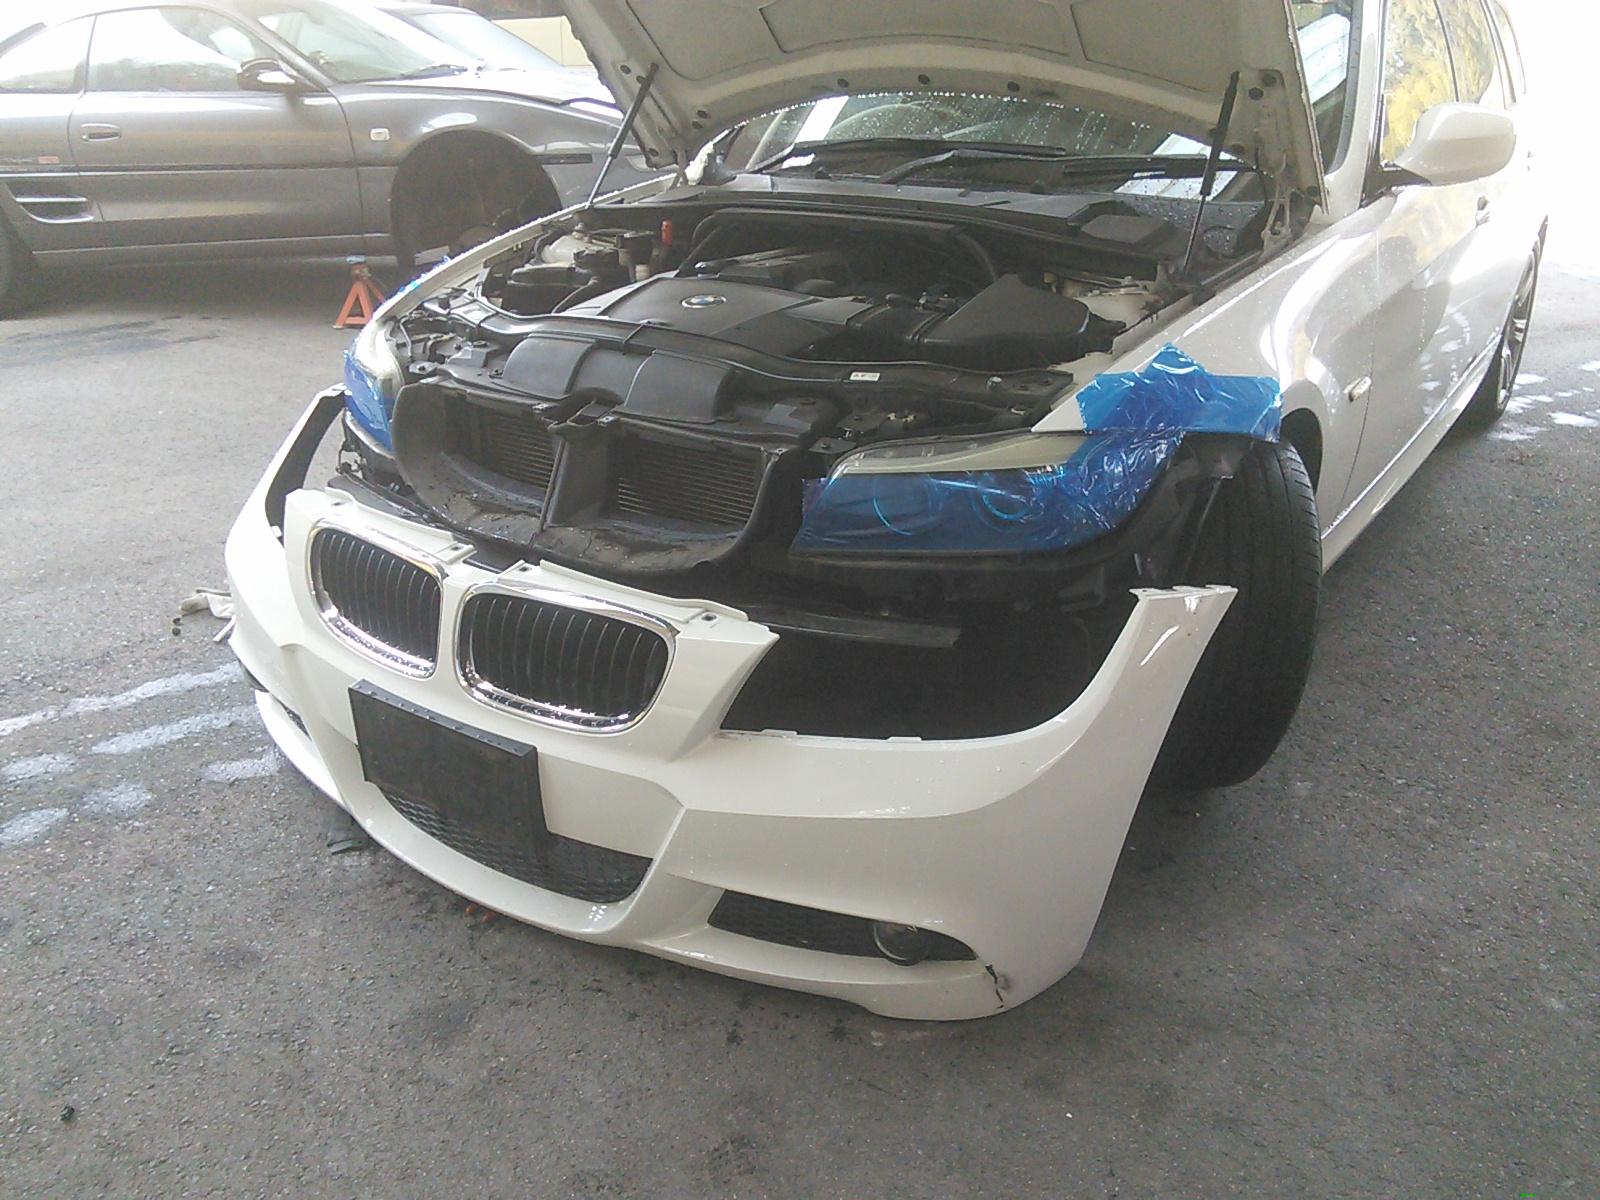 BMWフロントバンパー修理 合間に4AGブロック塗装 豊田市  板金塗装